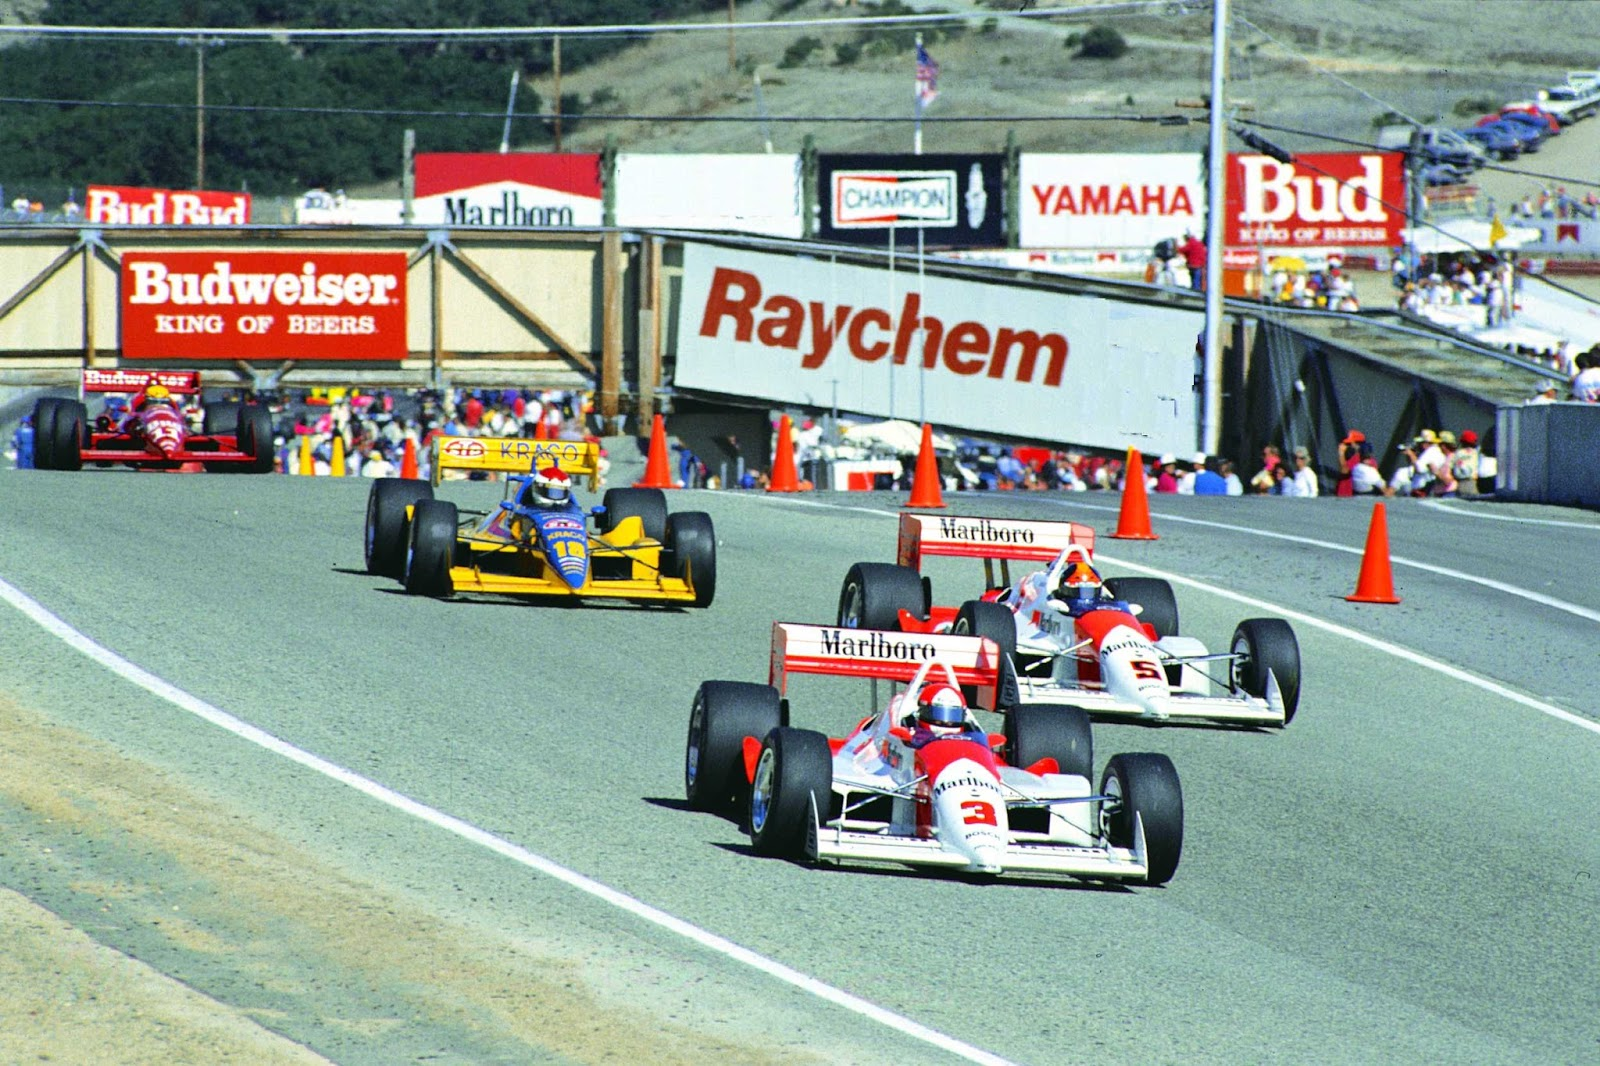 Indy at Laguna Seca - TheGentlemanRacer.com